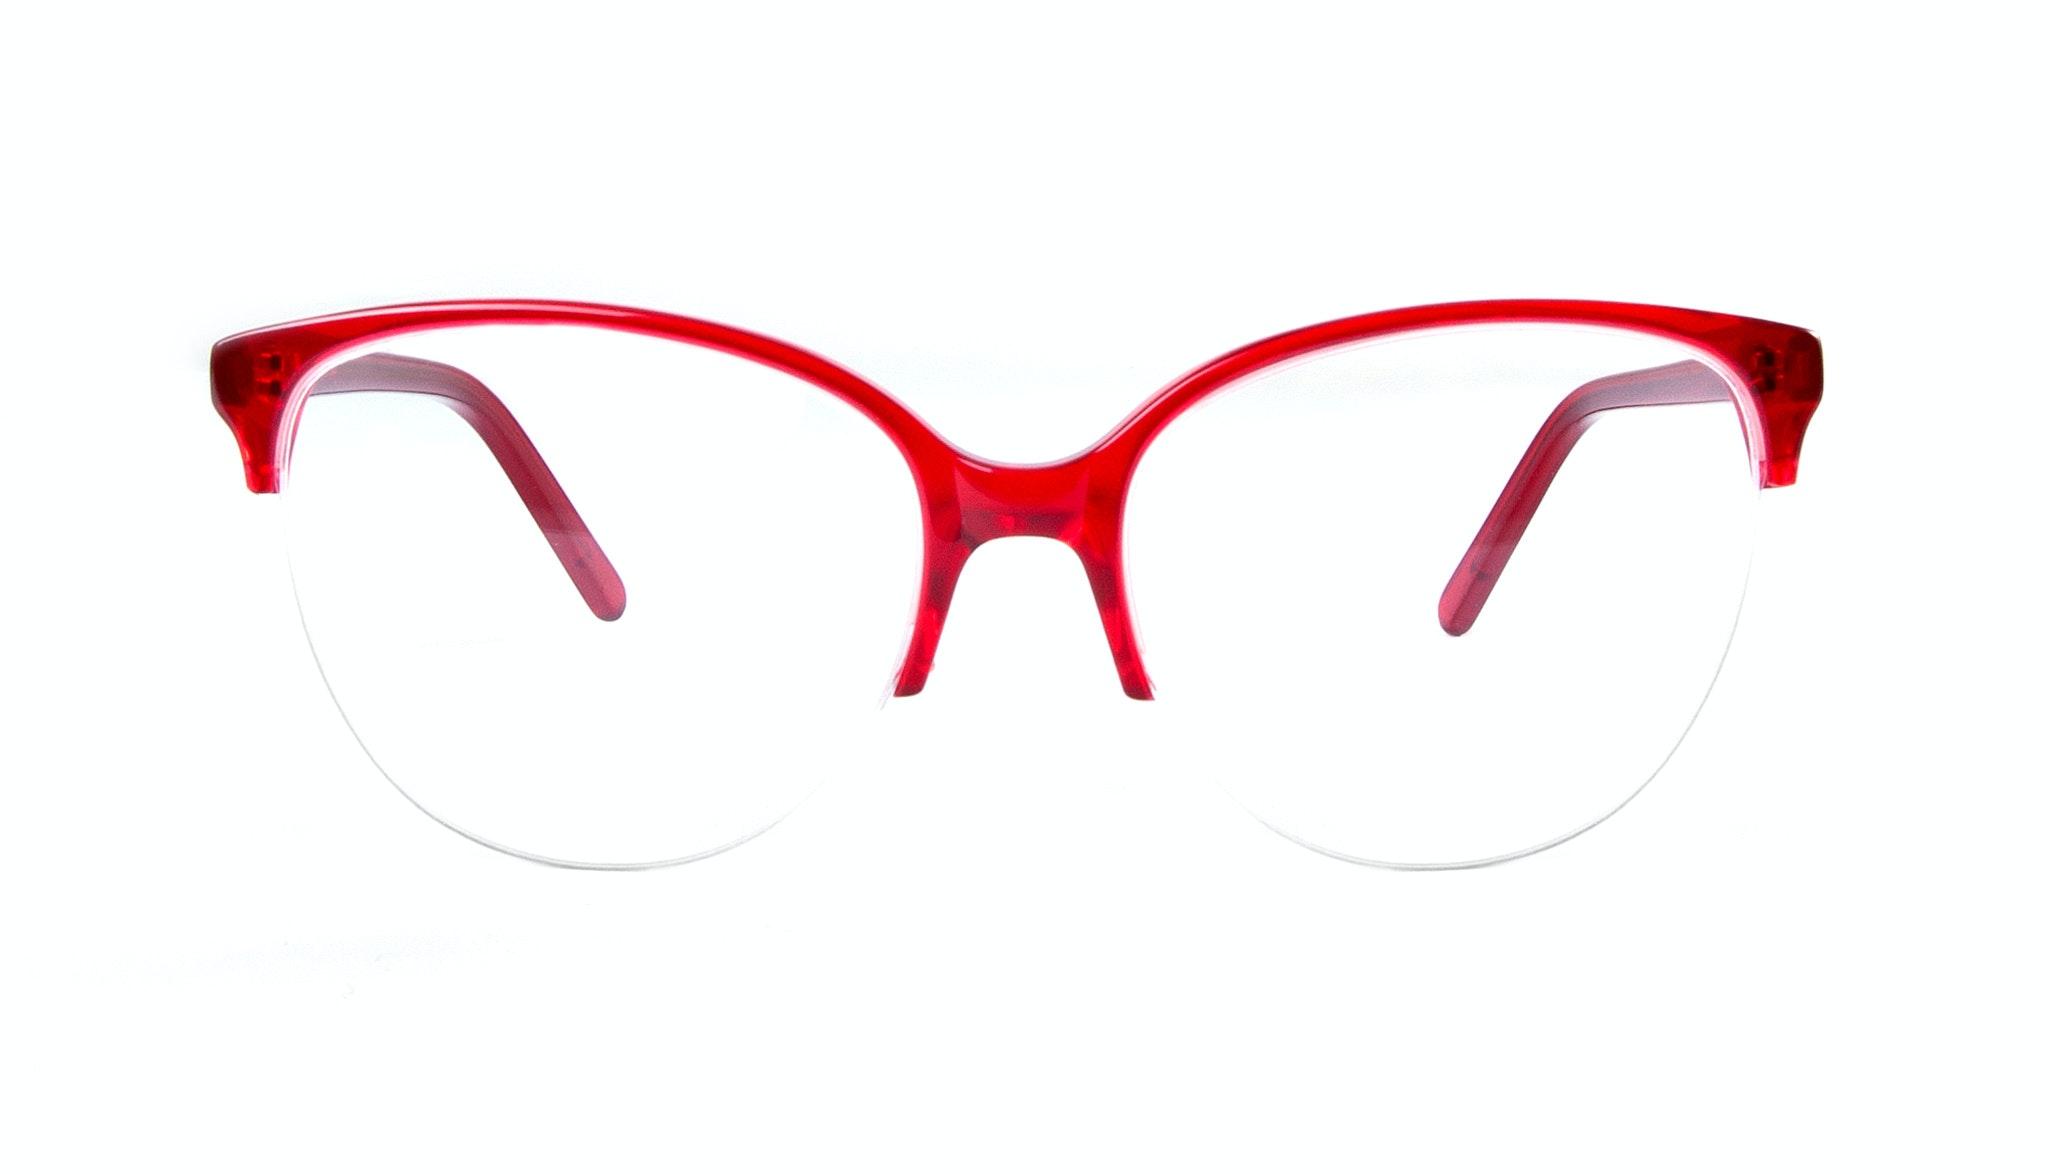 Affordable Fashion Glasses Cat Eye Round Semi-Rimless Eyeglasses Women Imagine Light Rouge